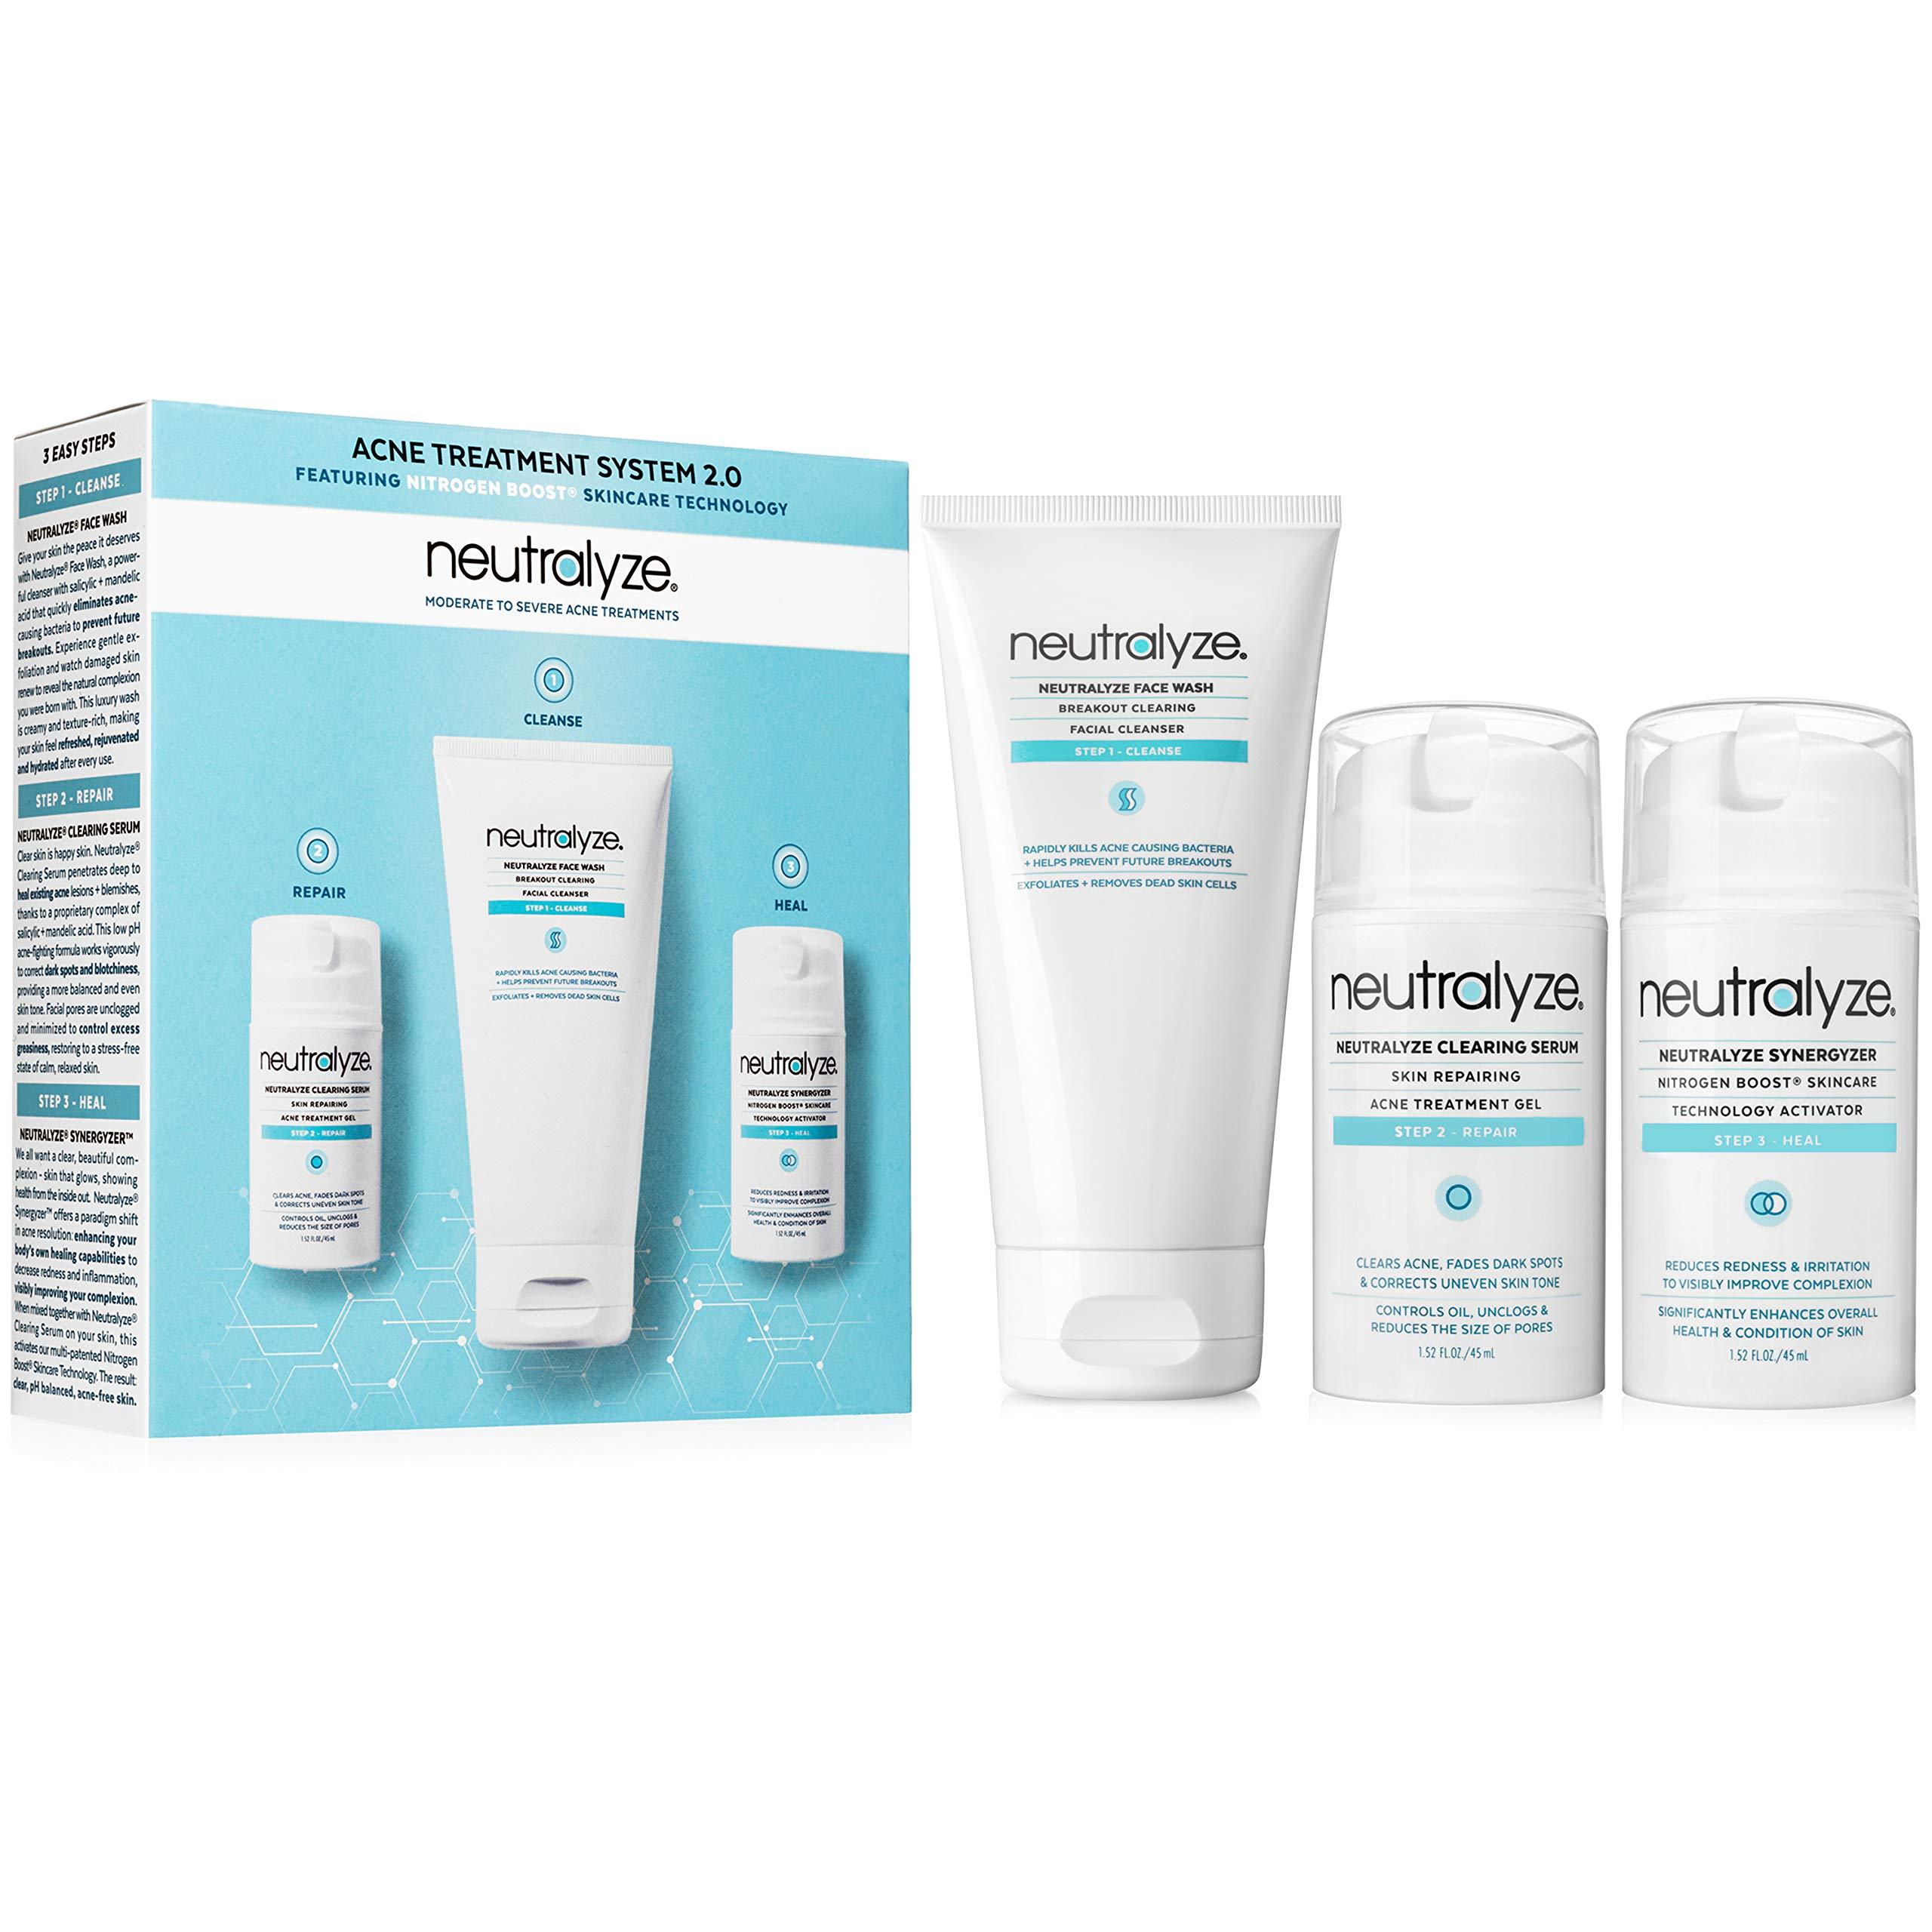 Neutralyze Moderate To Severe Acne Treatment Kit 2.0 - Maximum Strength Acne Treatment System with 2% Salicylic Acid + 1% Mandelic Acid + Nitrogen Boost Skincare Technology